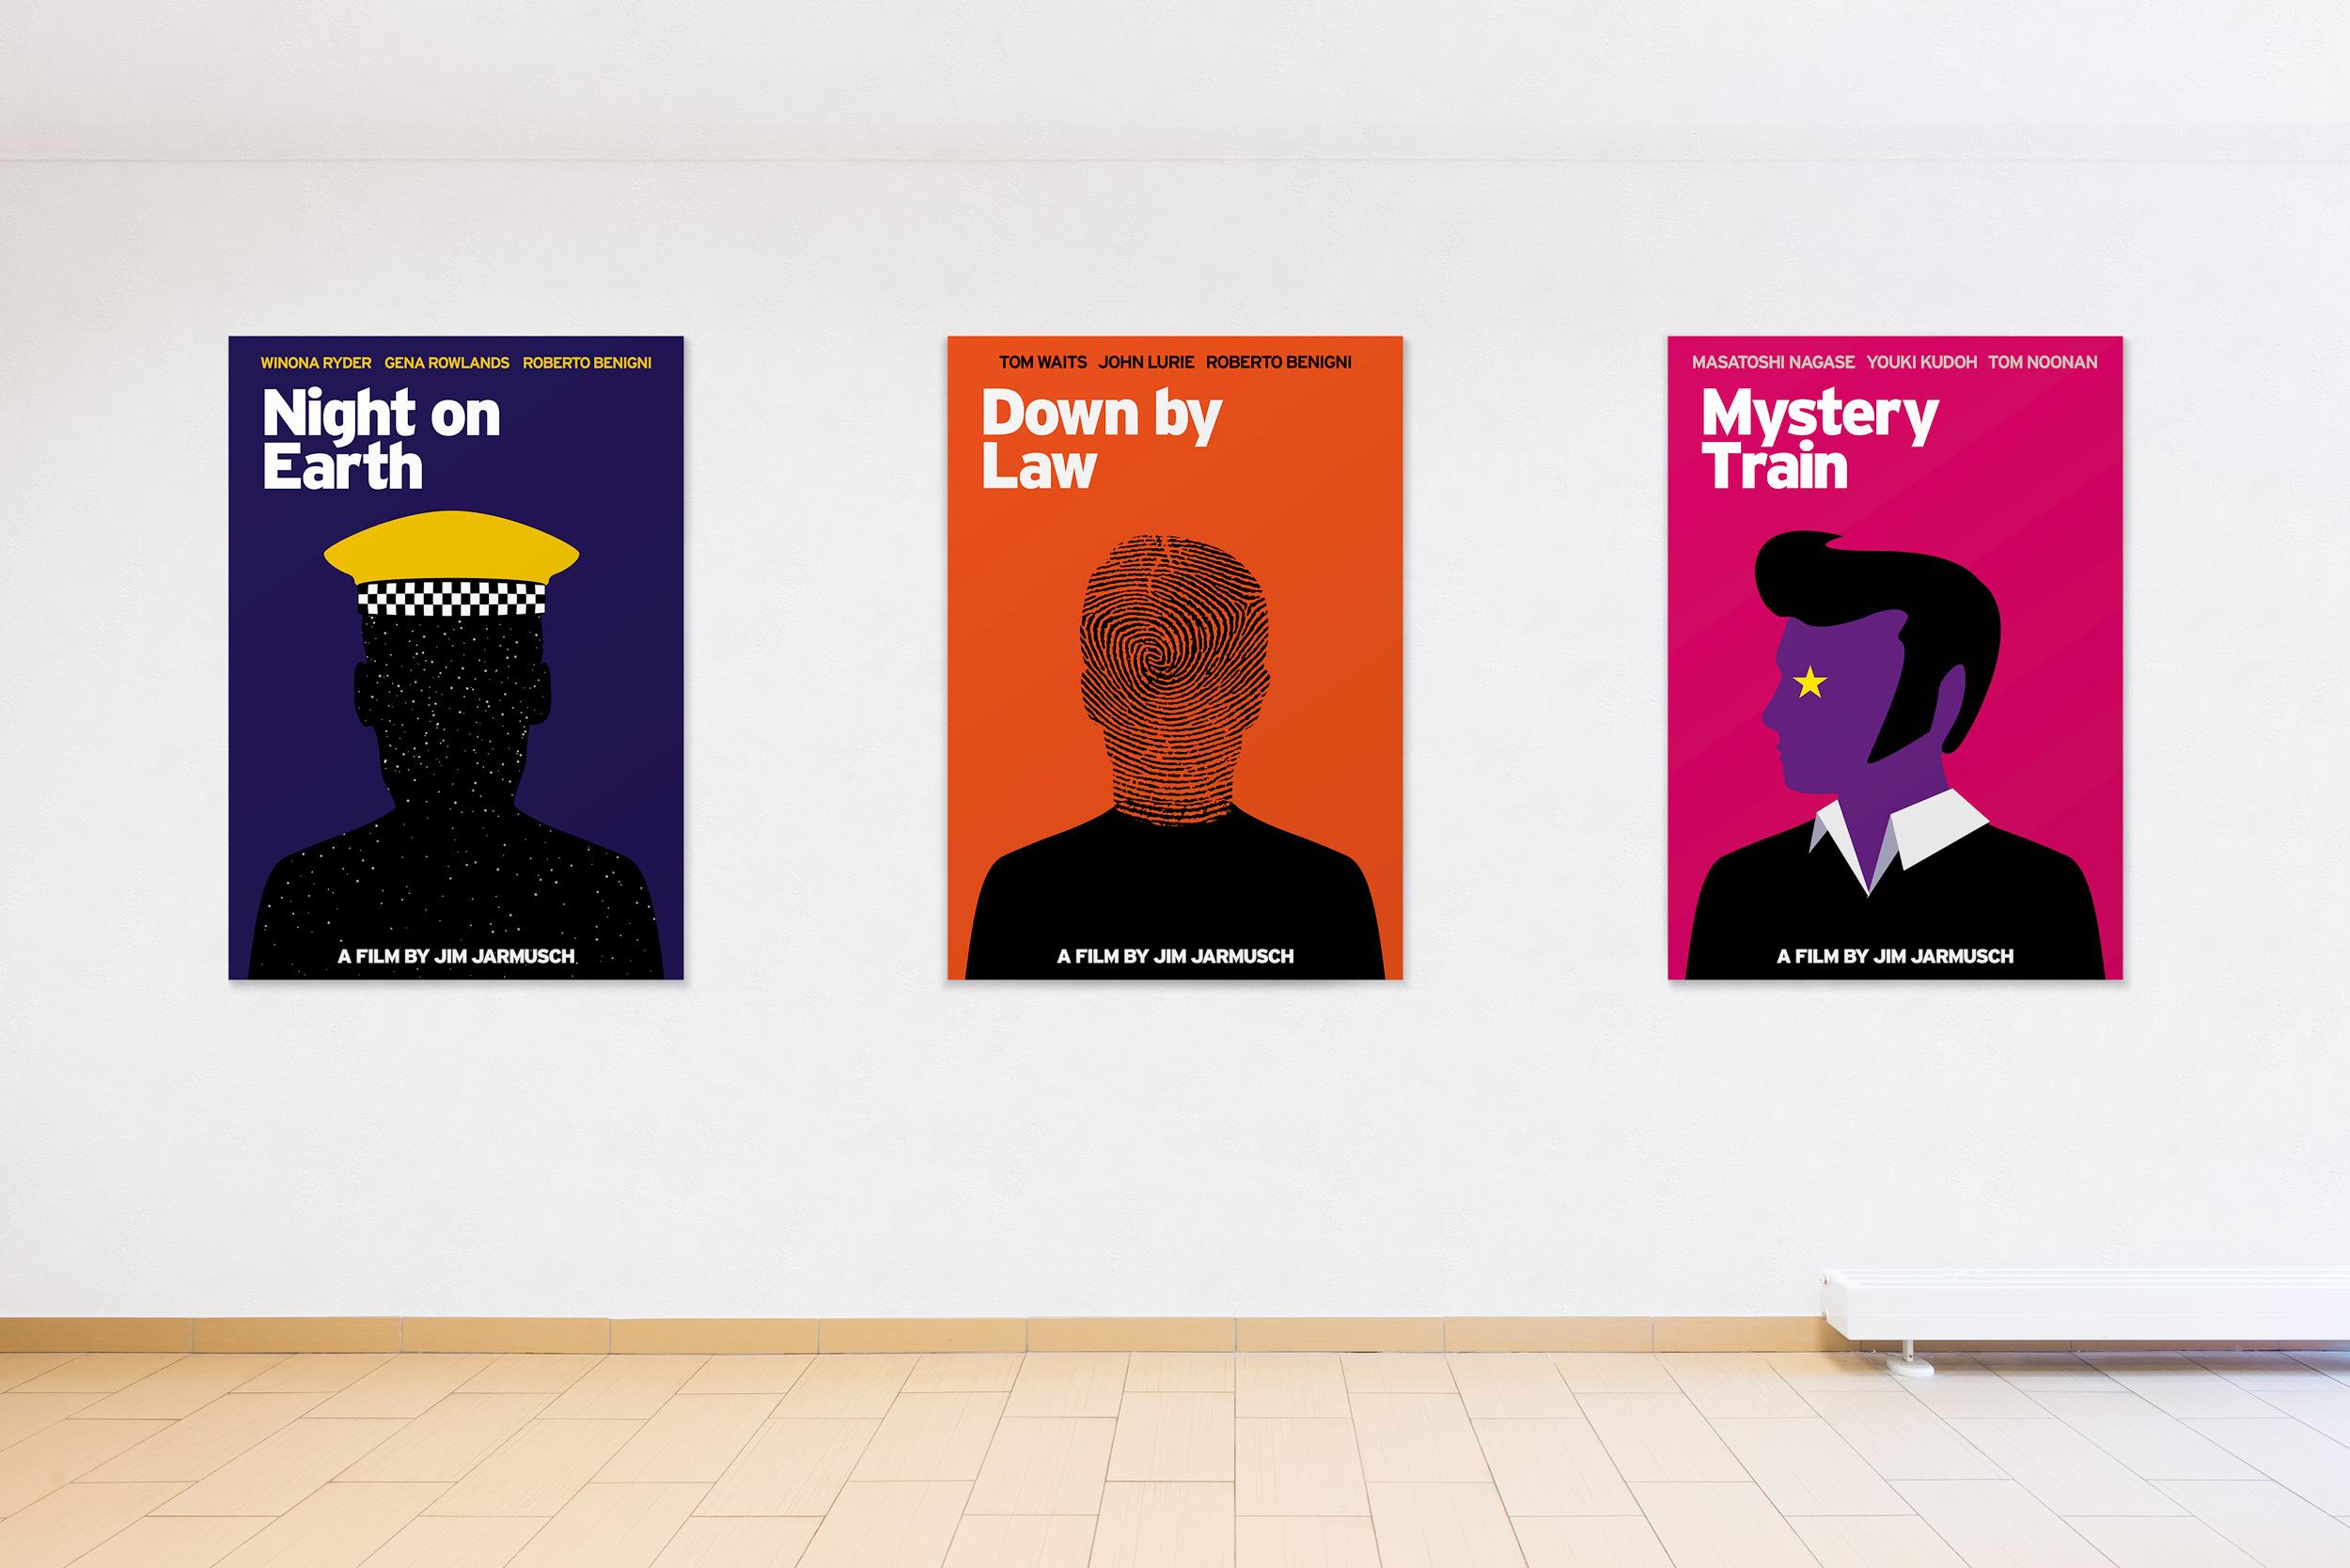 jimjarmusch-design-movie-posters-content-mix-01